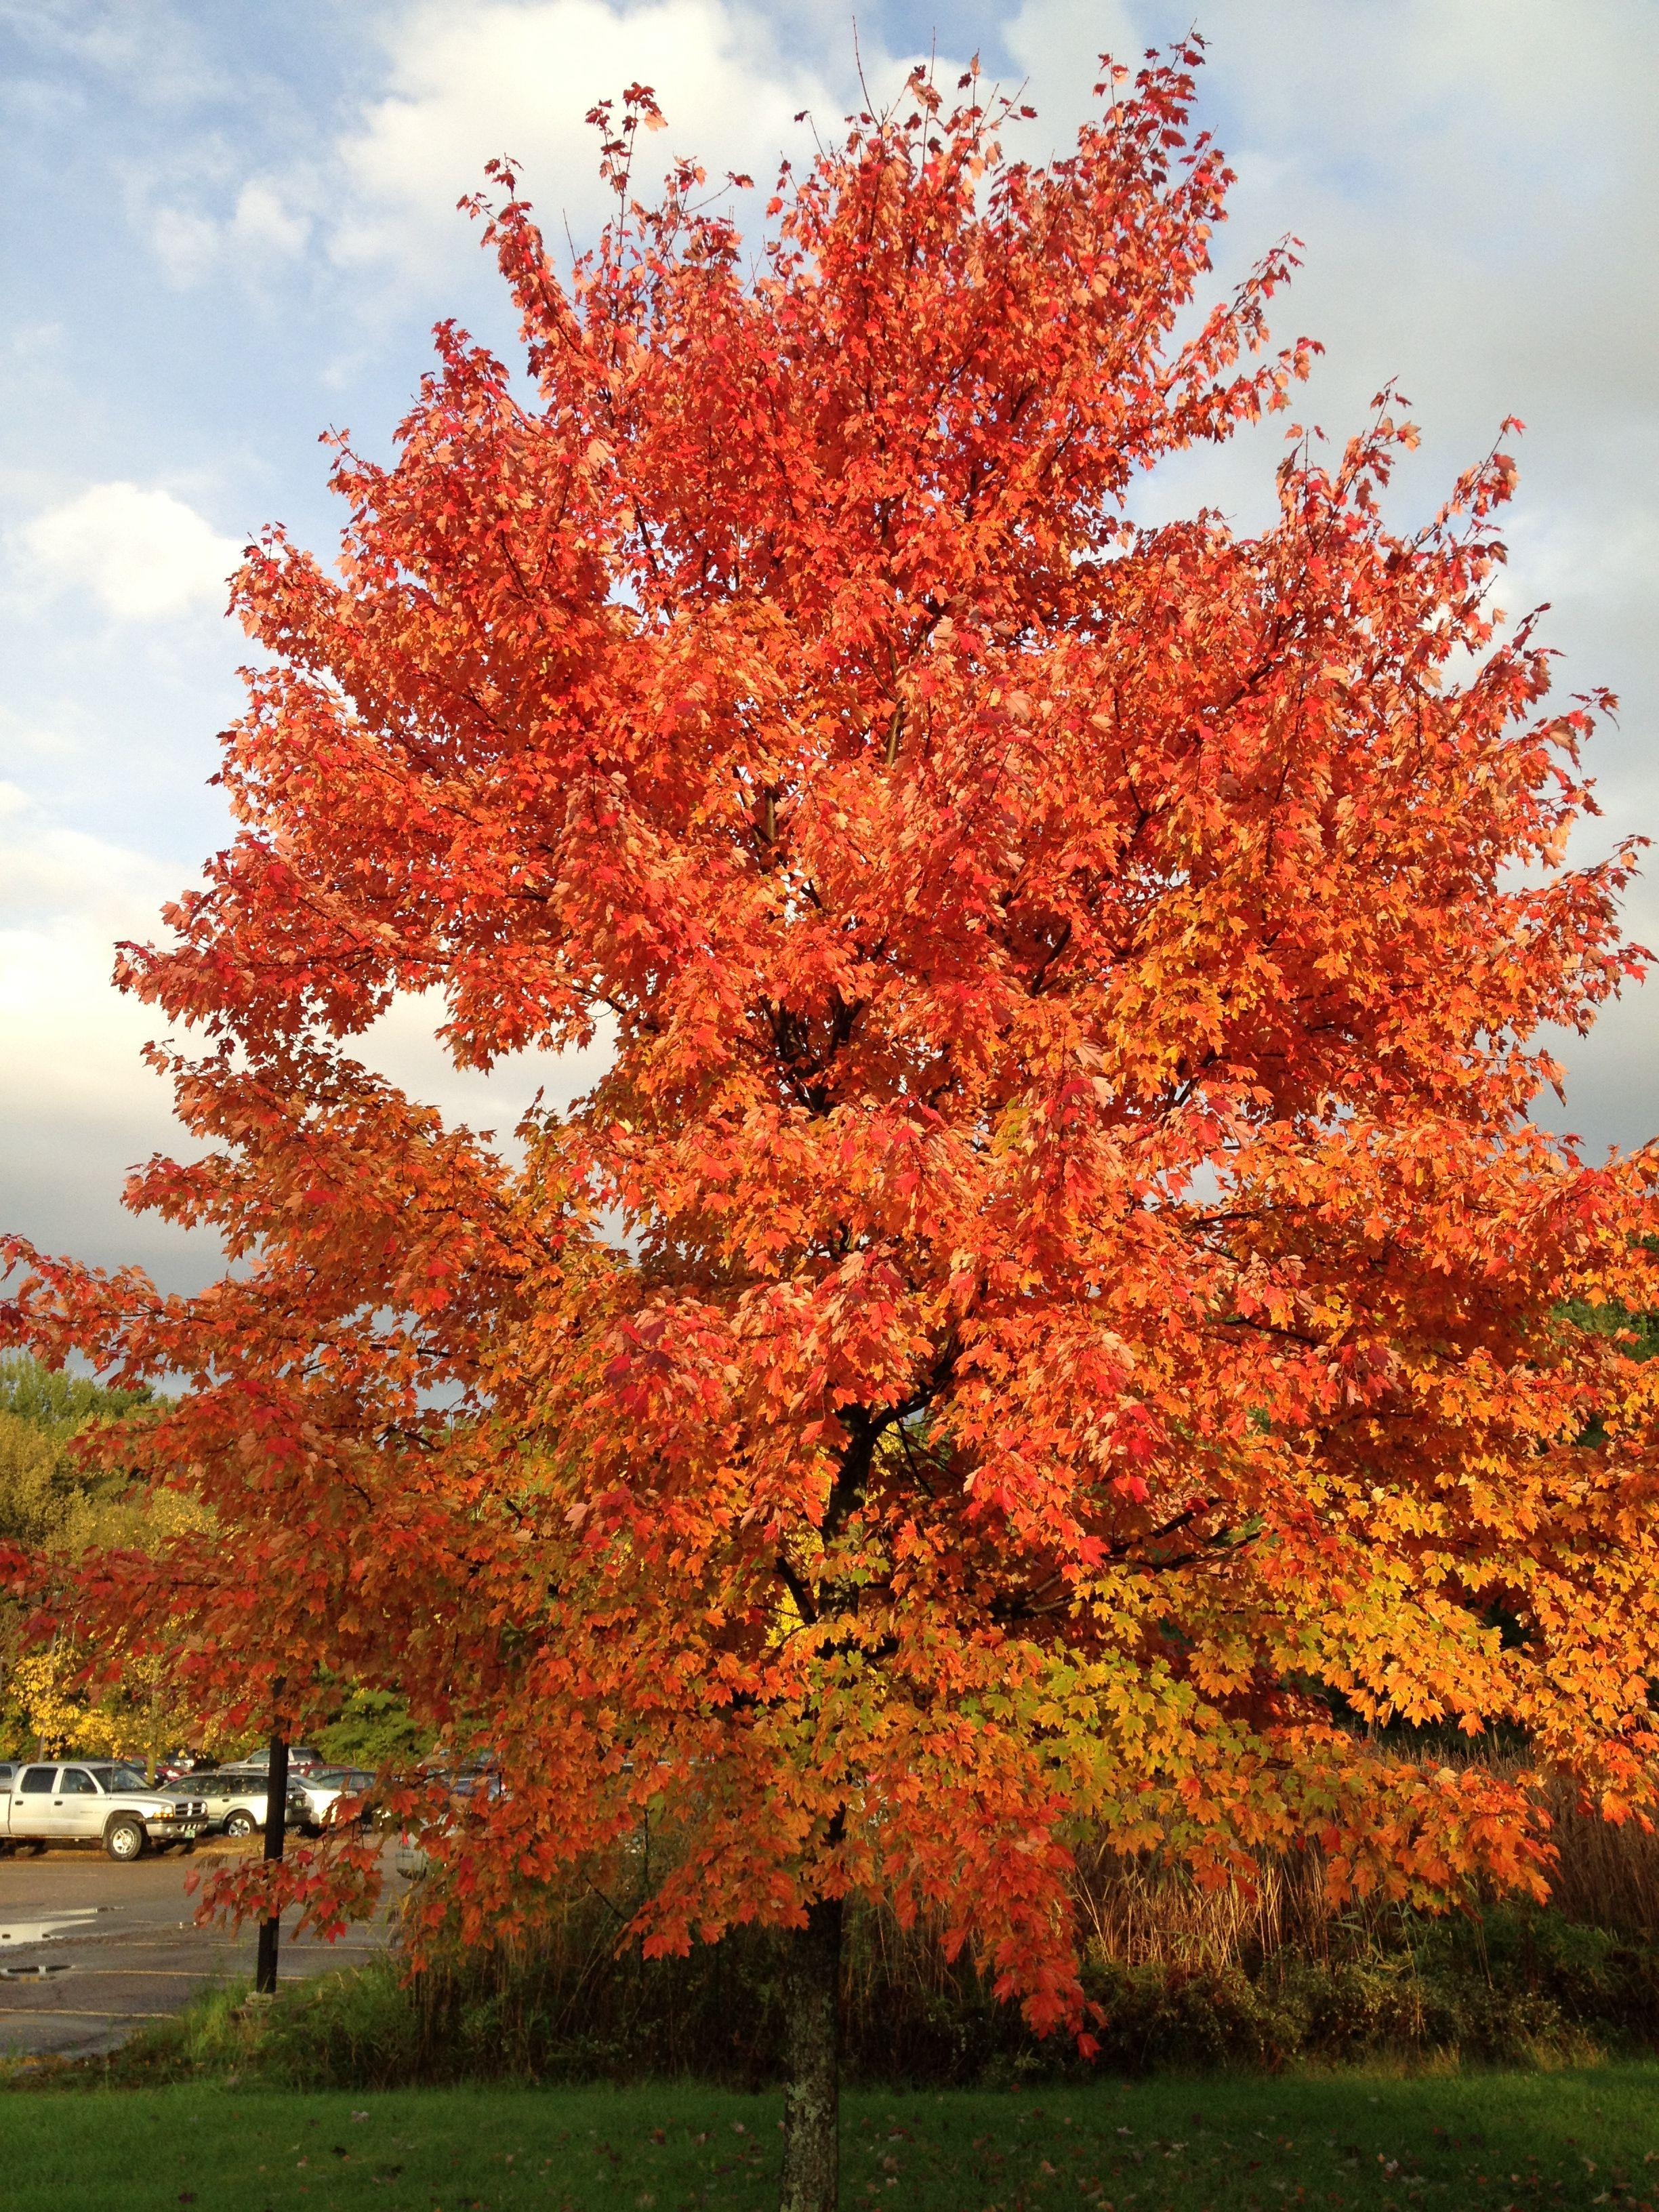 The Foliage In Burlington Vt Looks Great Foliage Plants Travel